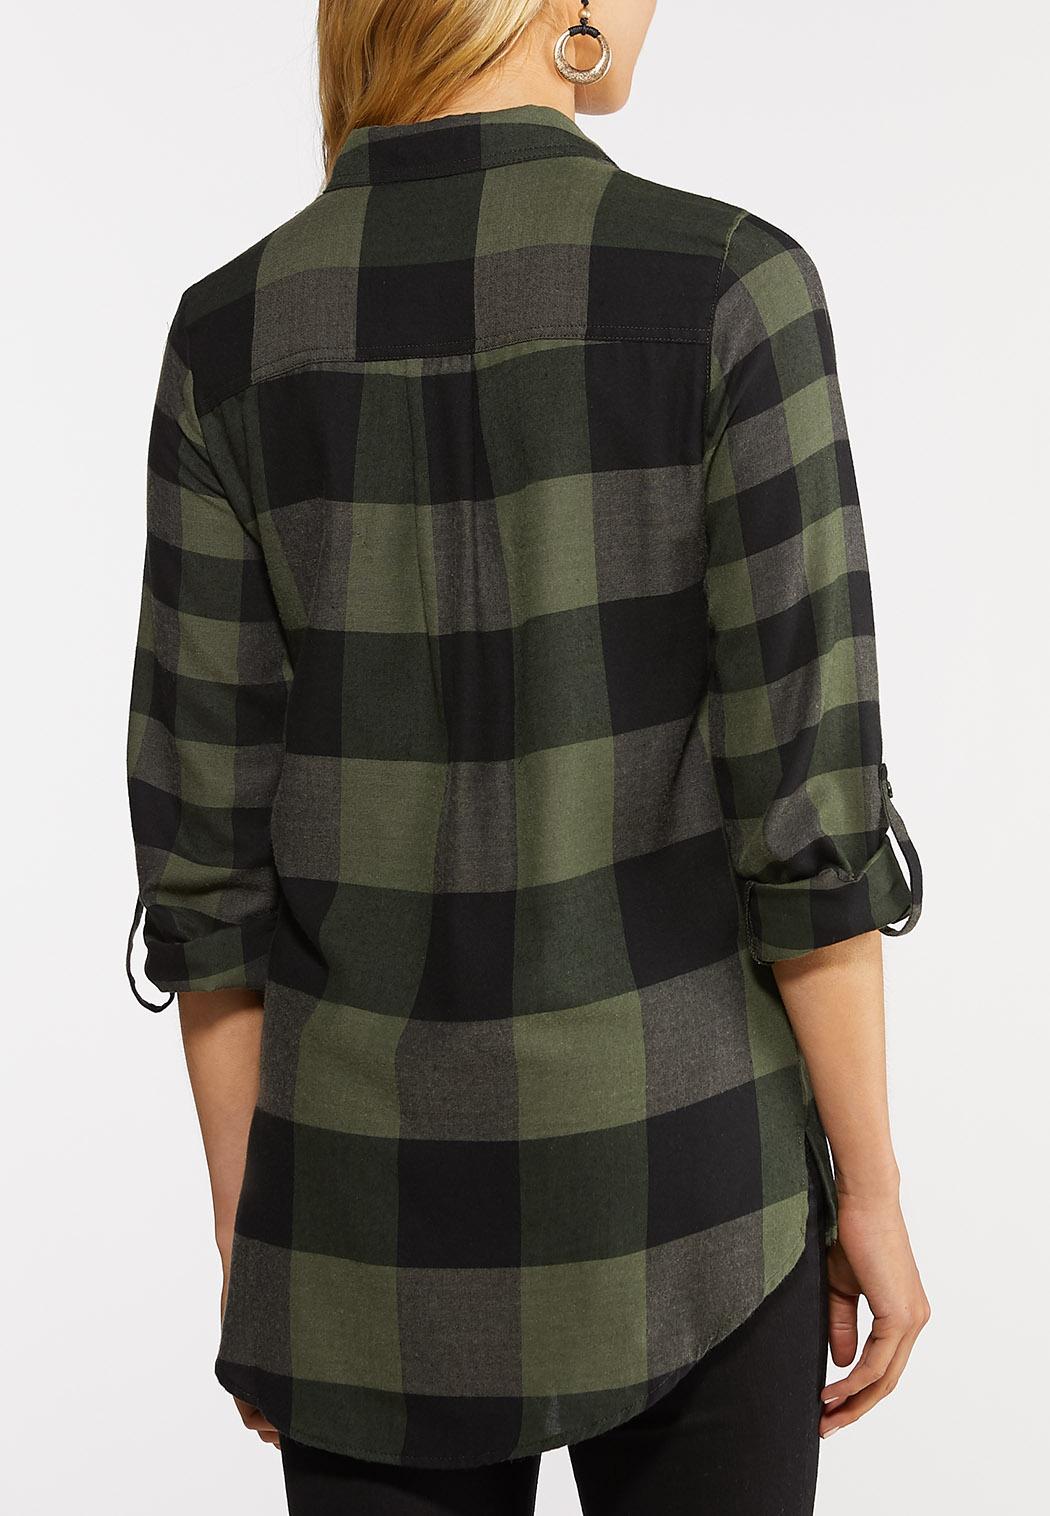 Black And Green Plaid Shirt (Item #43969514)